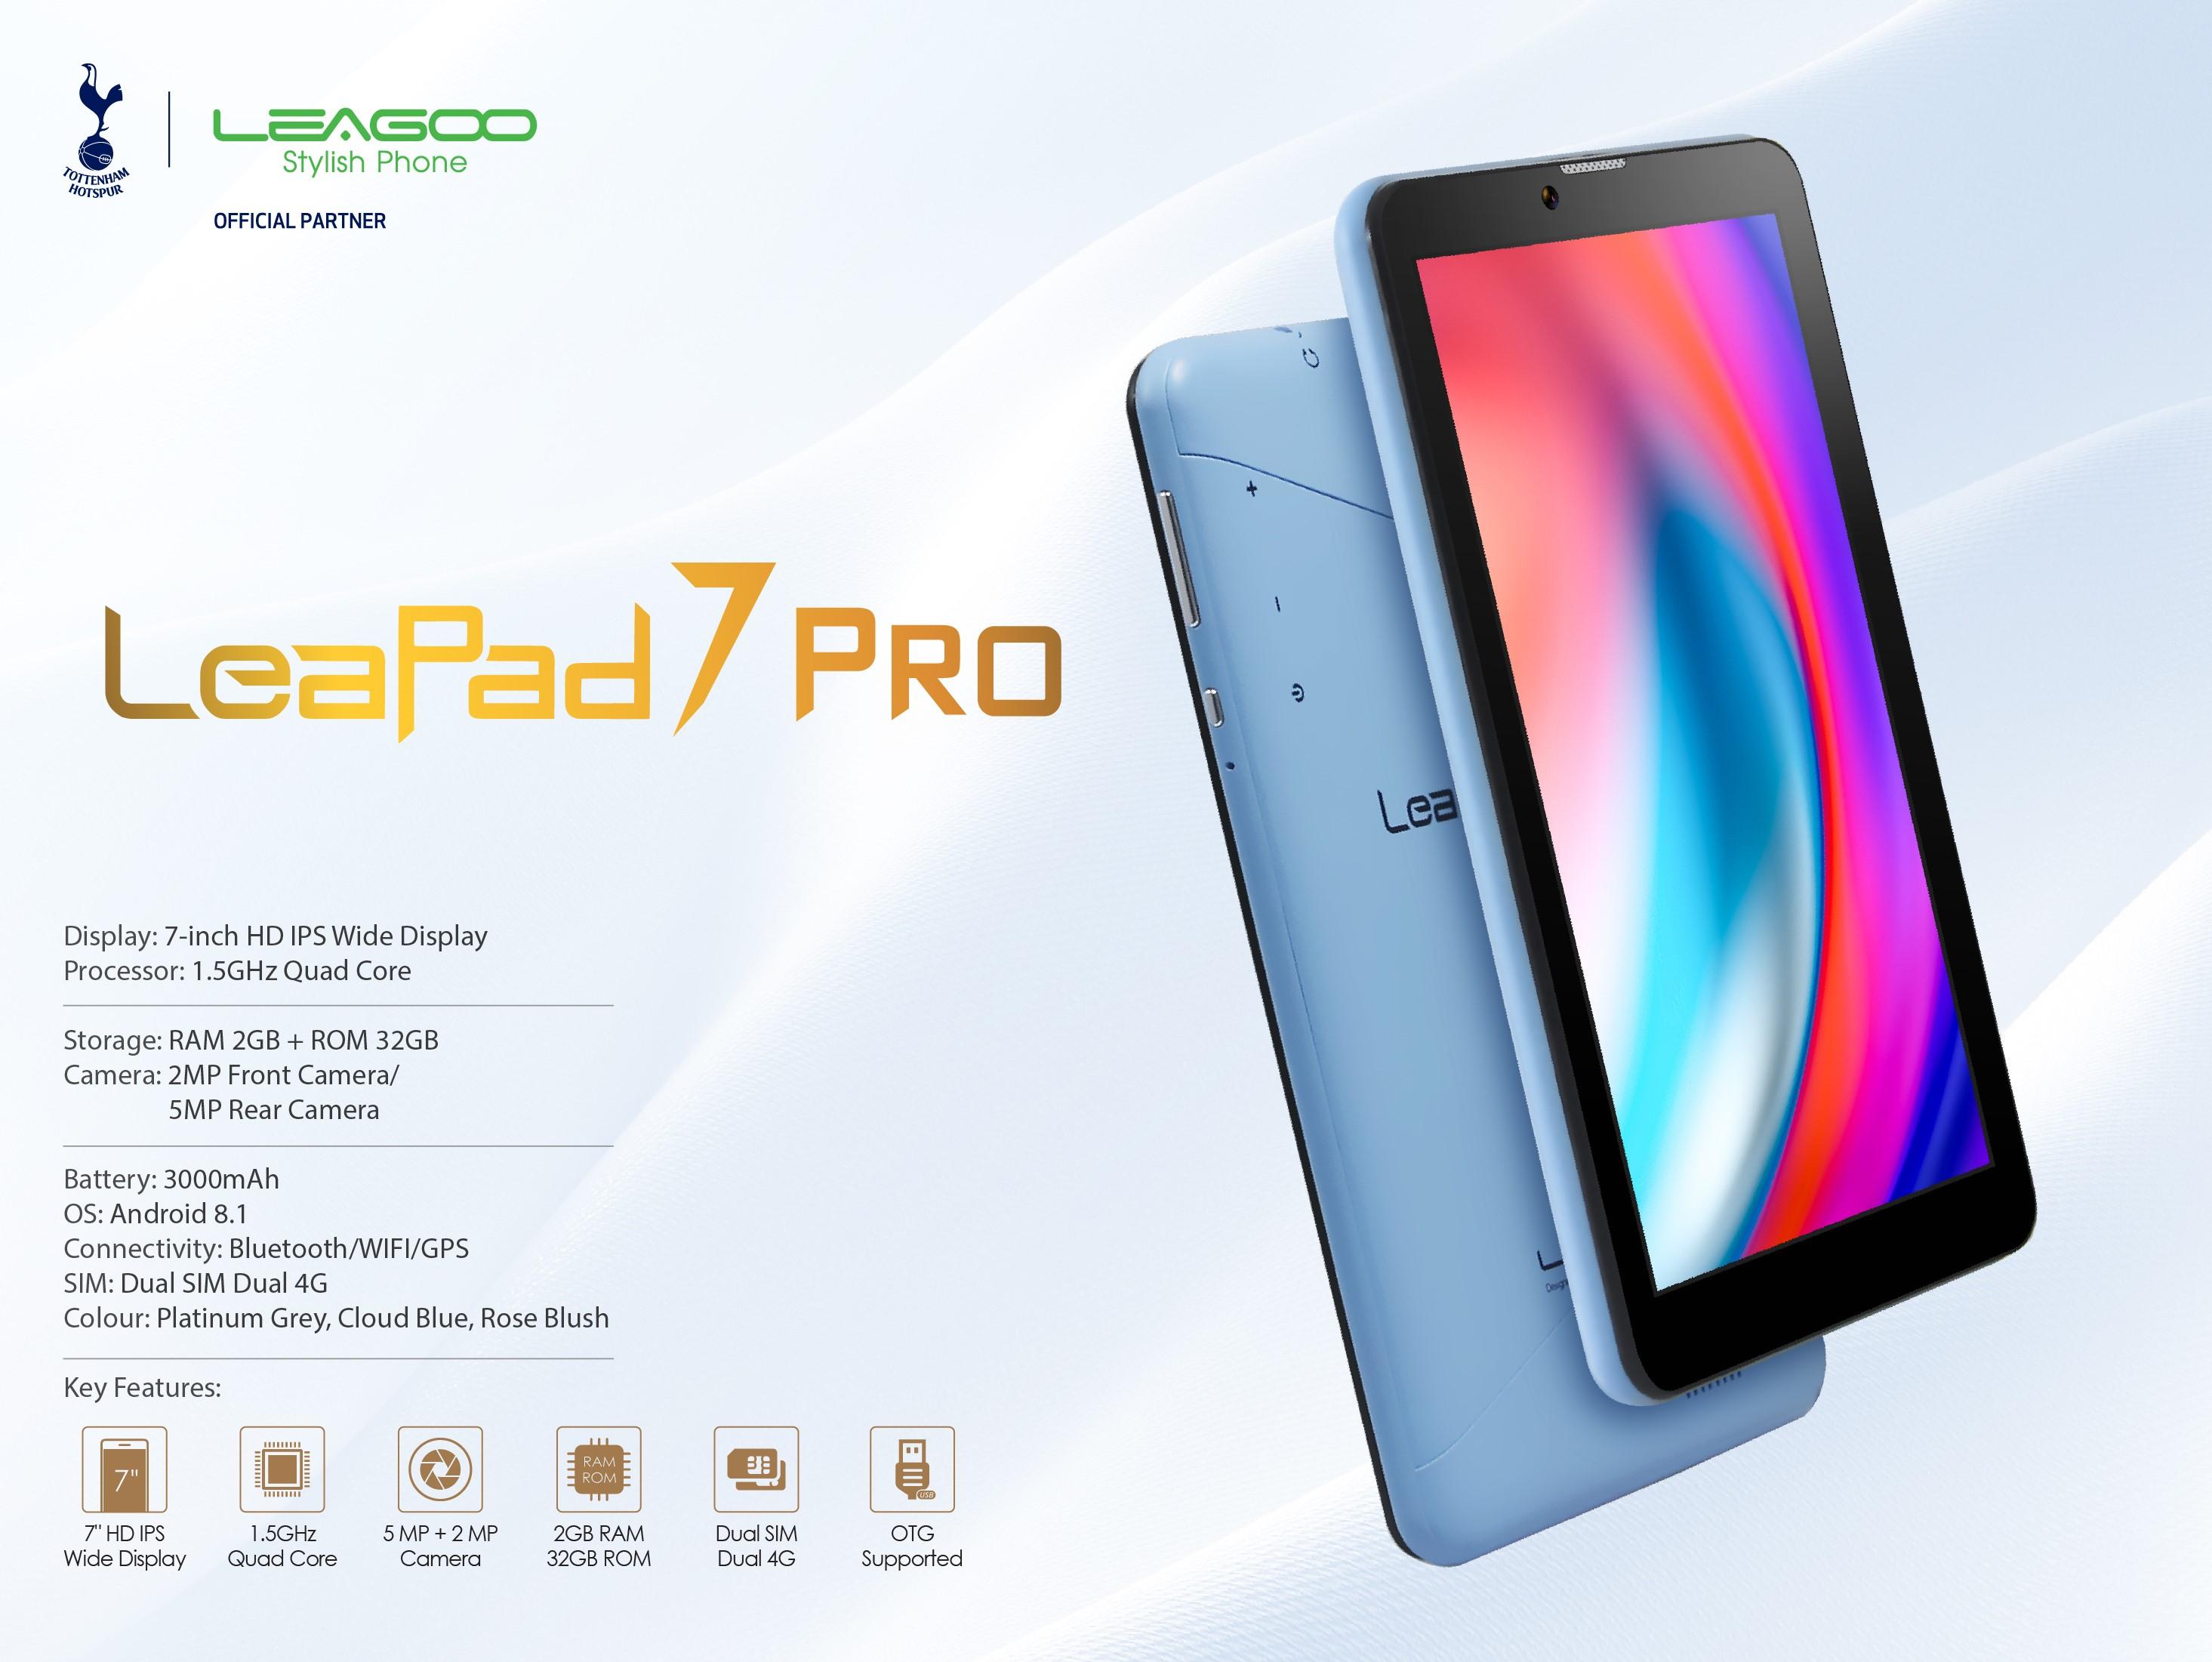 LPD 7P_NO PRICE